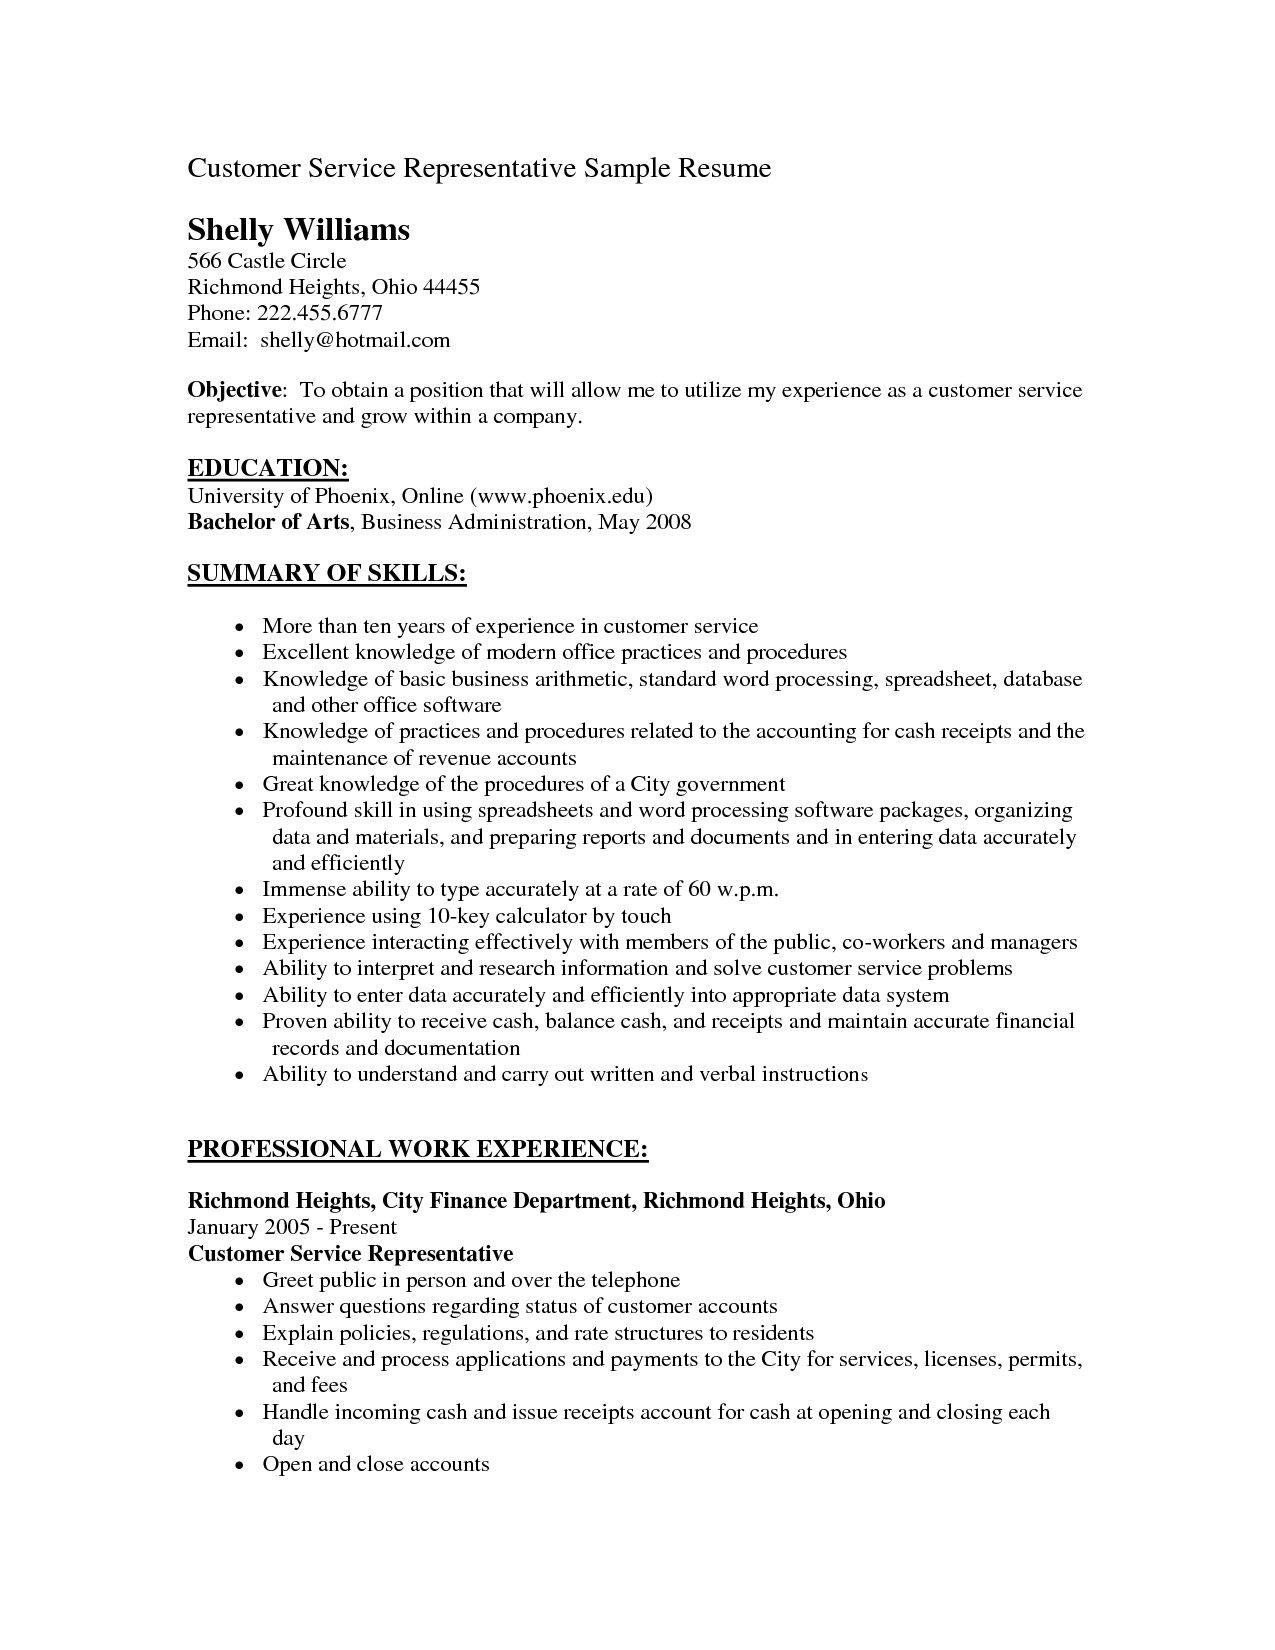 Resume Objective Customer Service Representative